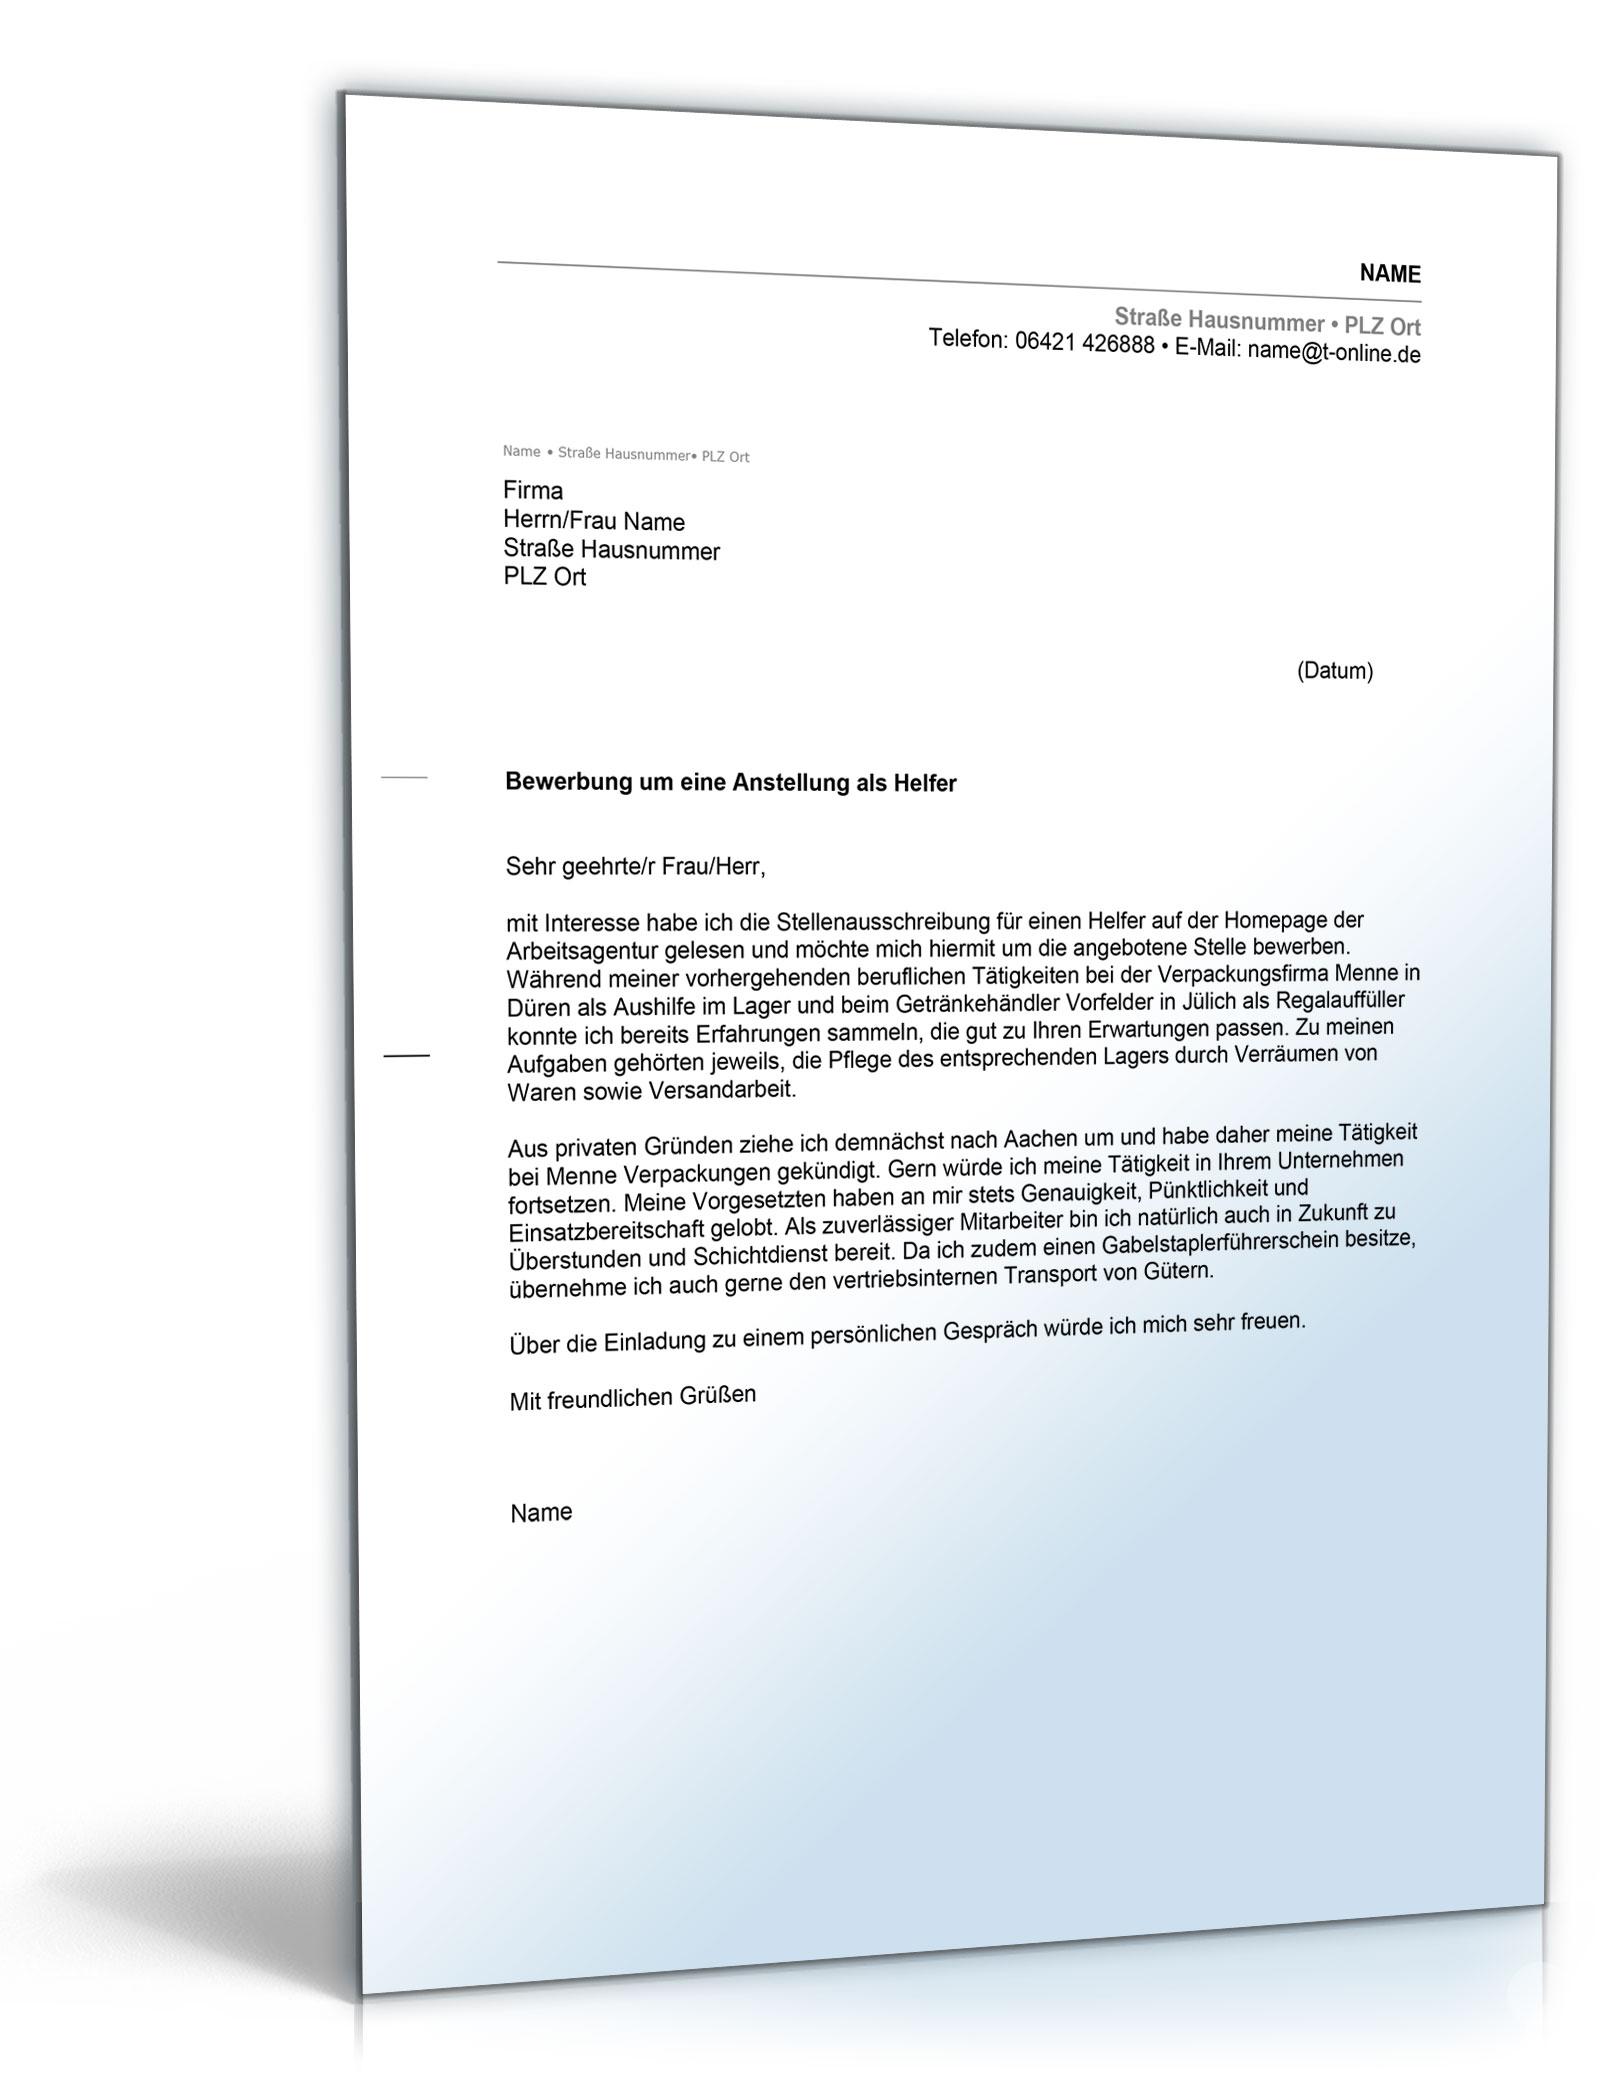 Anschreiben Bewerbung Helfer [Word Dokument] [Download]: Amazon.de: Software